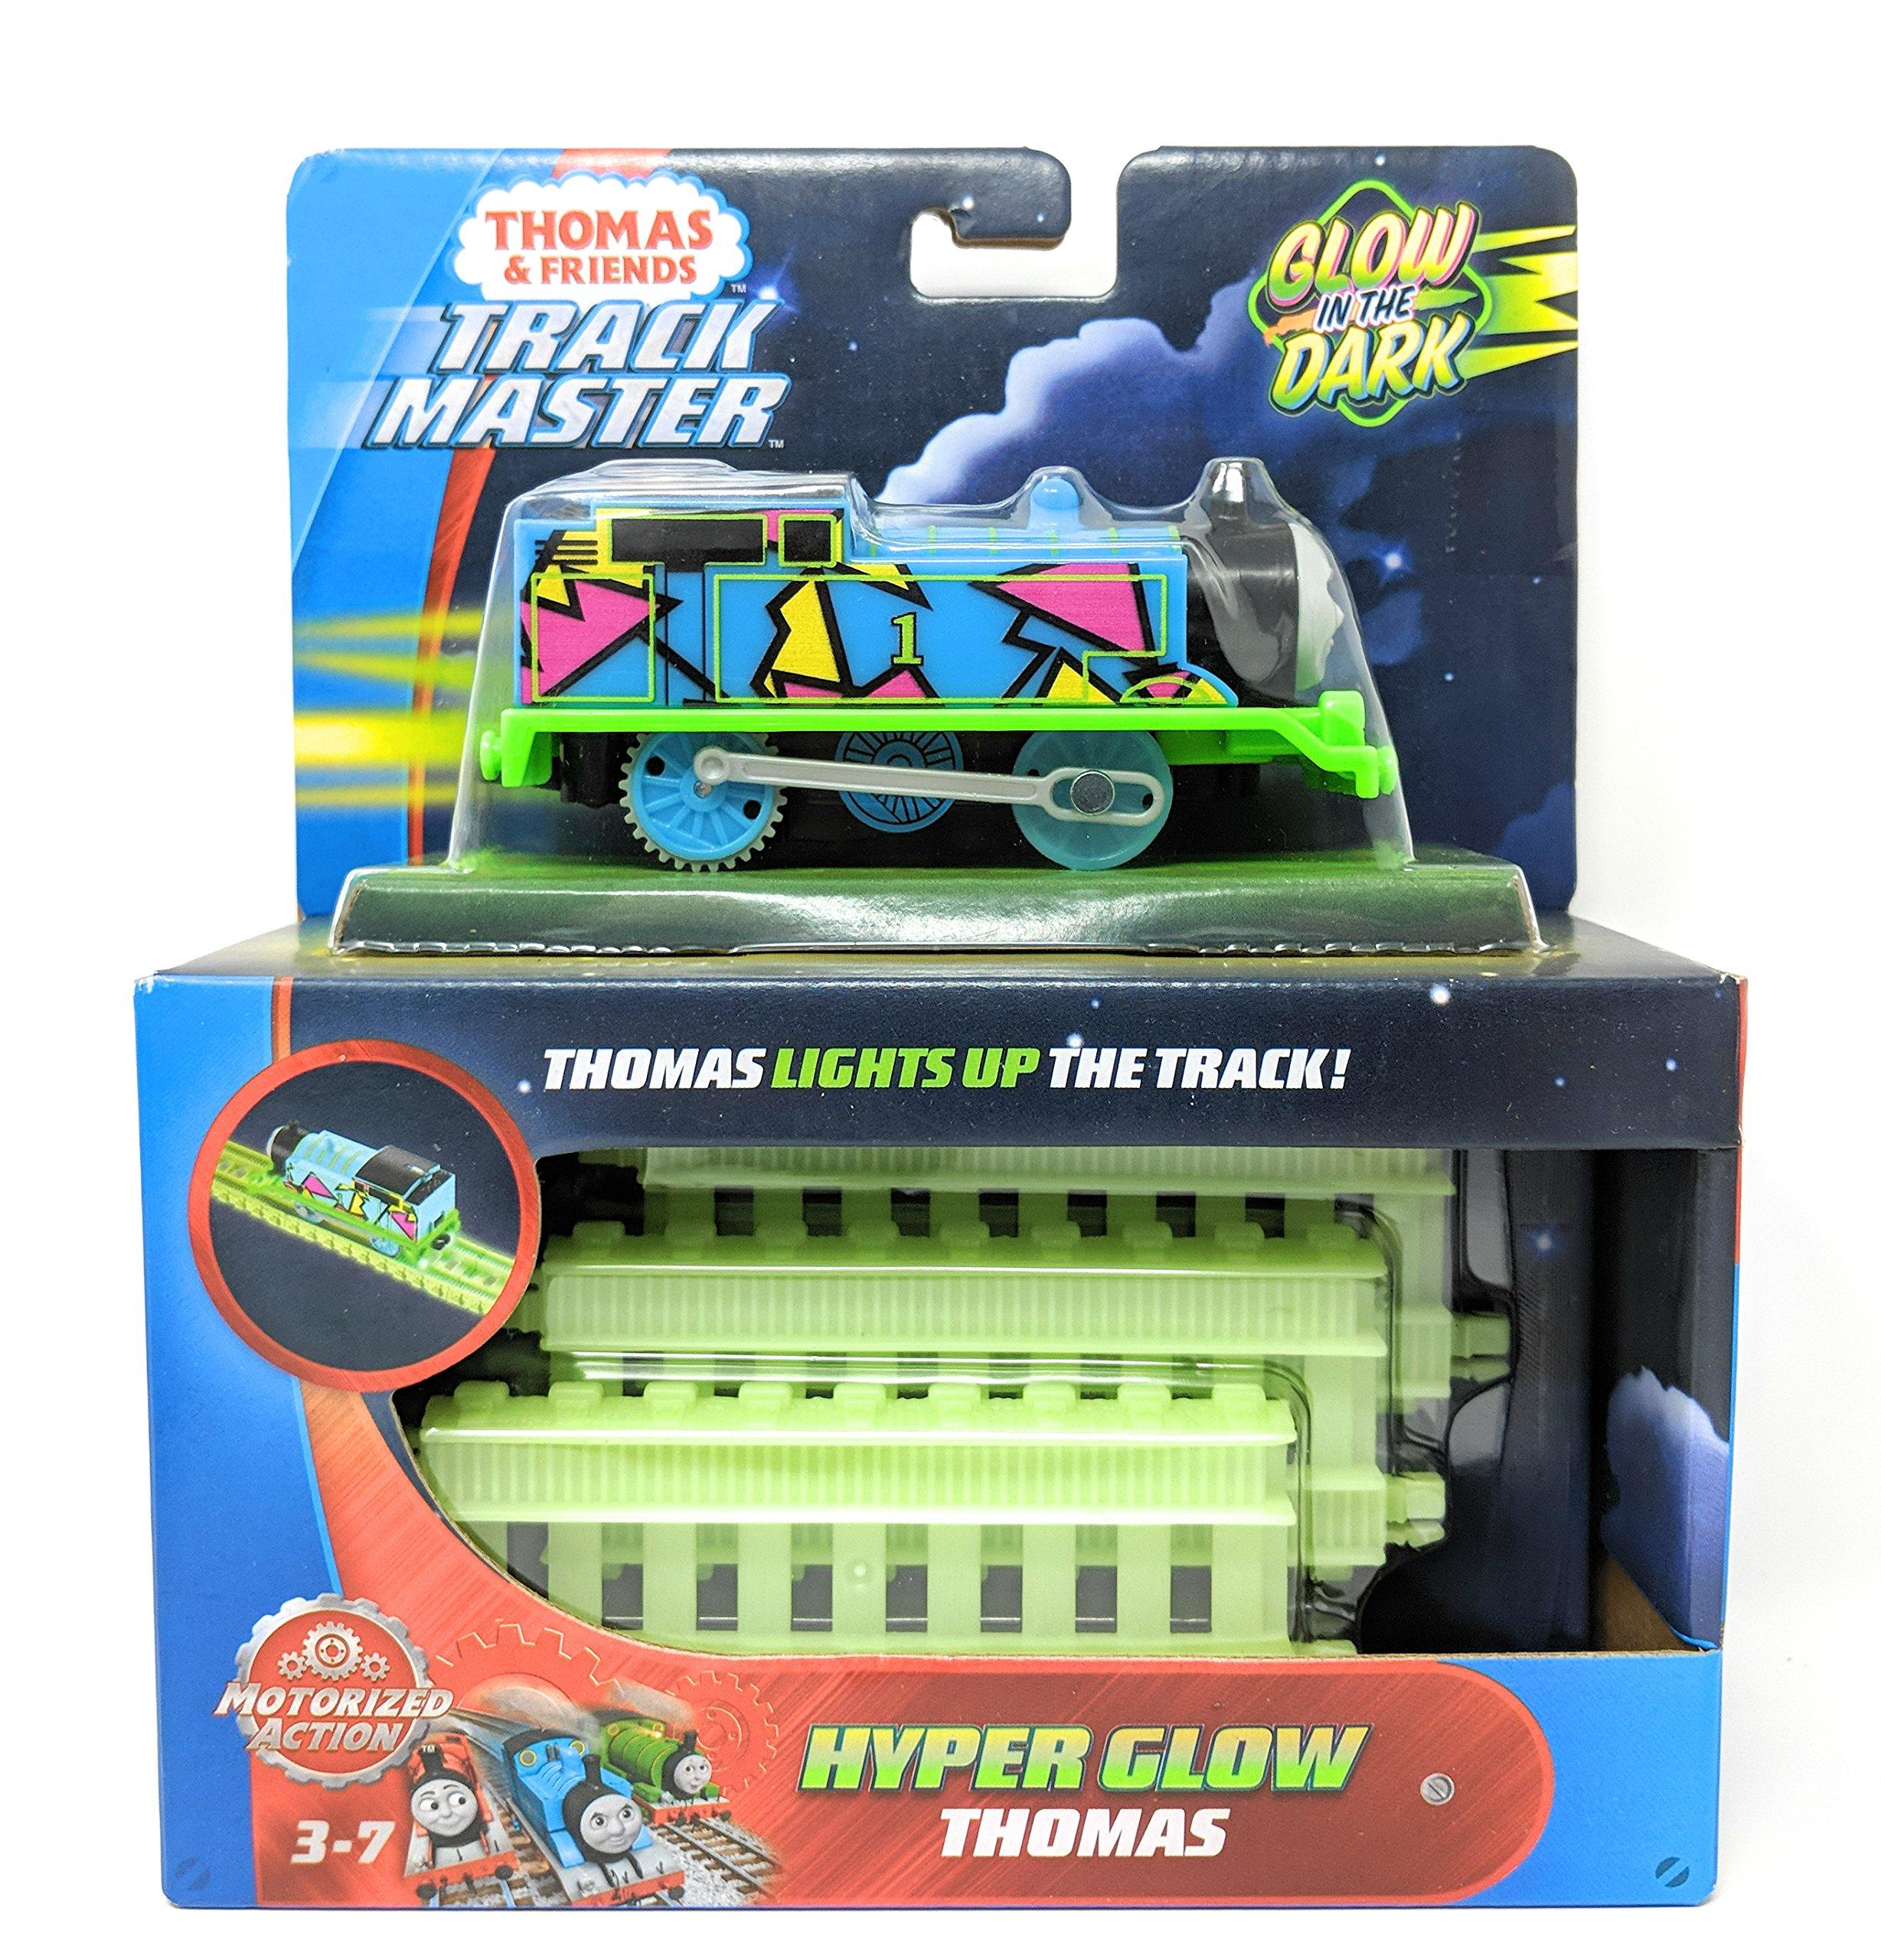 Thomas & Friends Fisher-Price TrackMaster, Motorized Hyper Glow Thomas